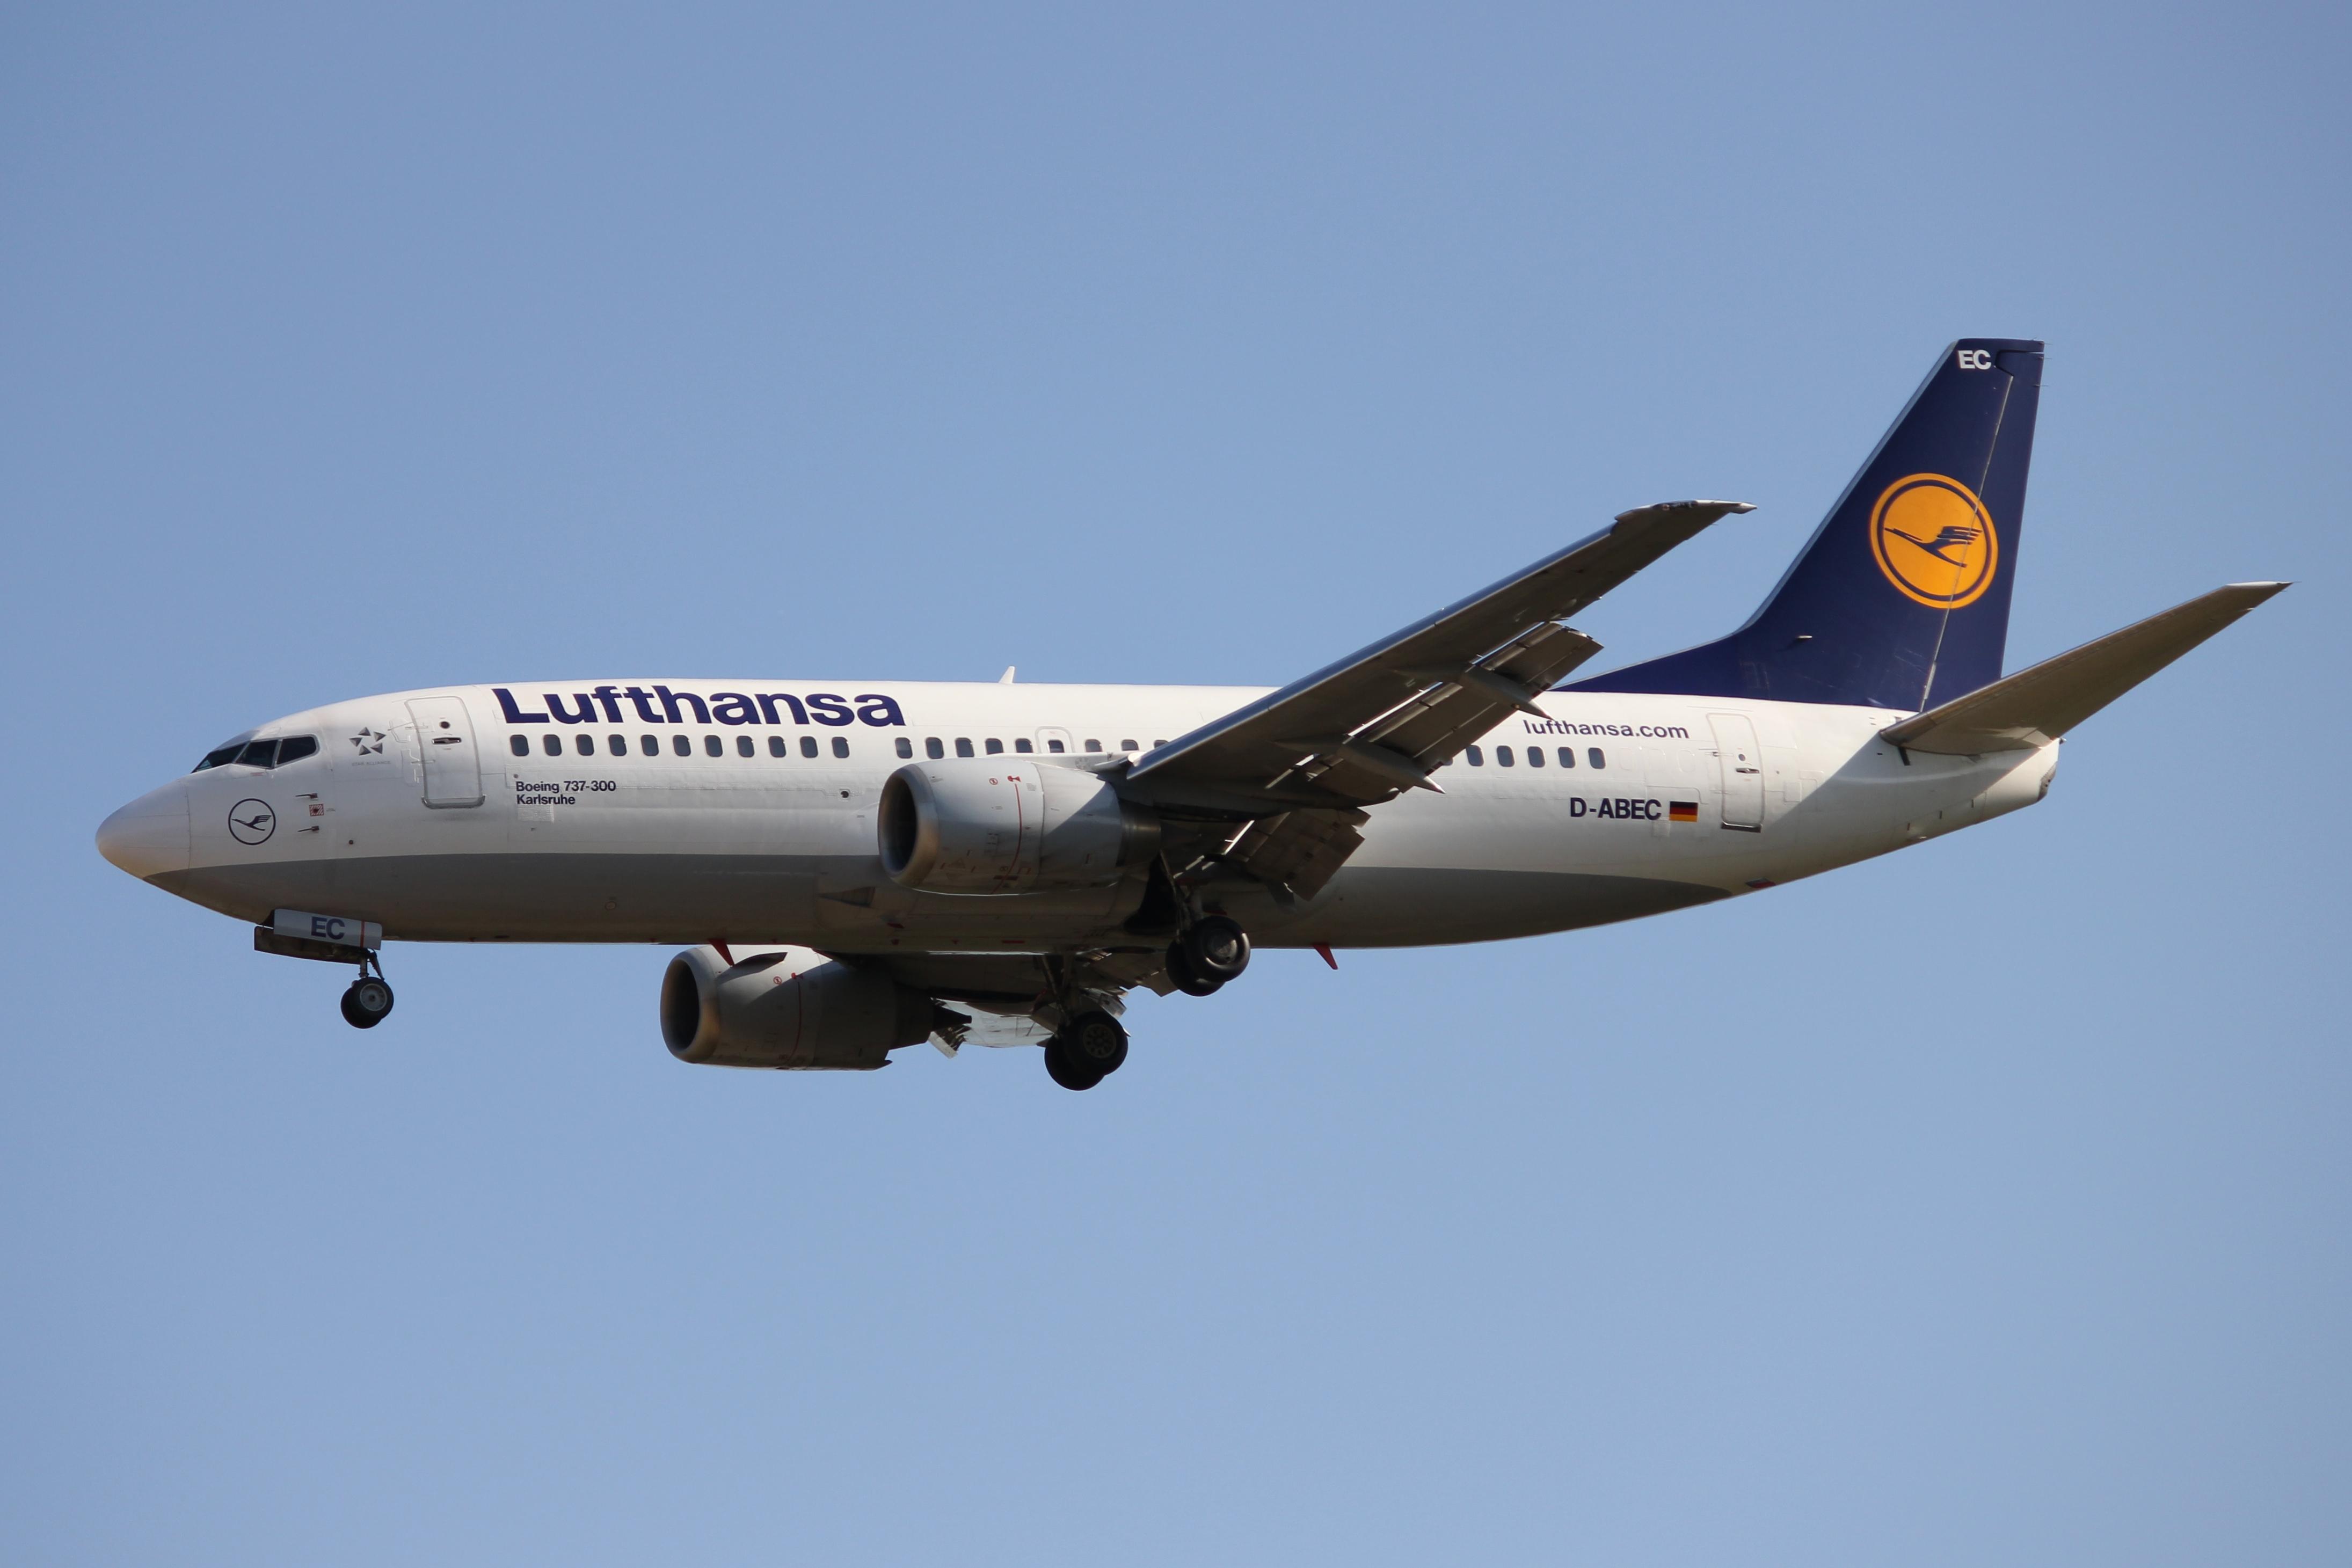 File:Lufthansa 733 D-ABEC.JPG